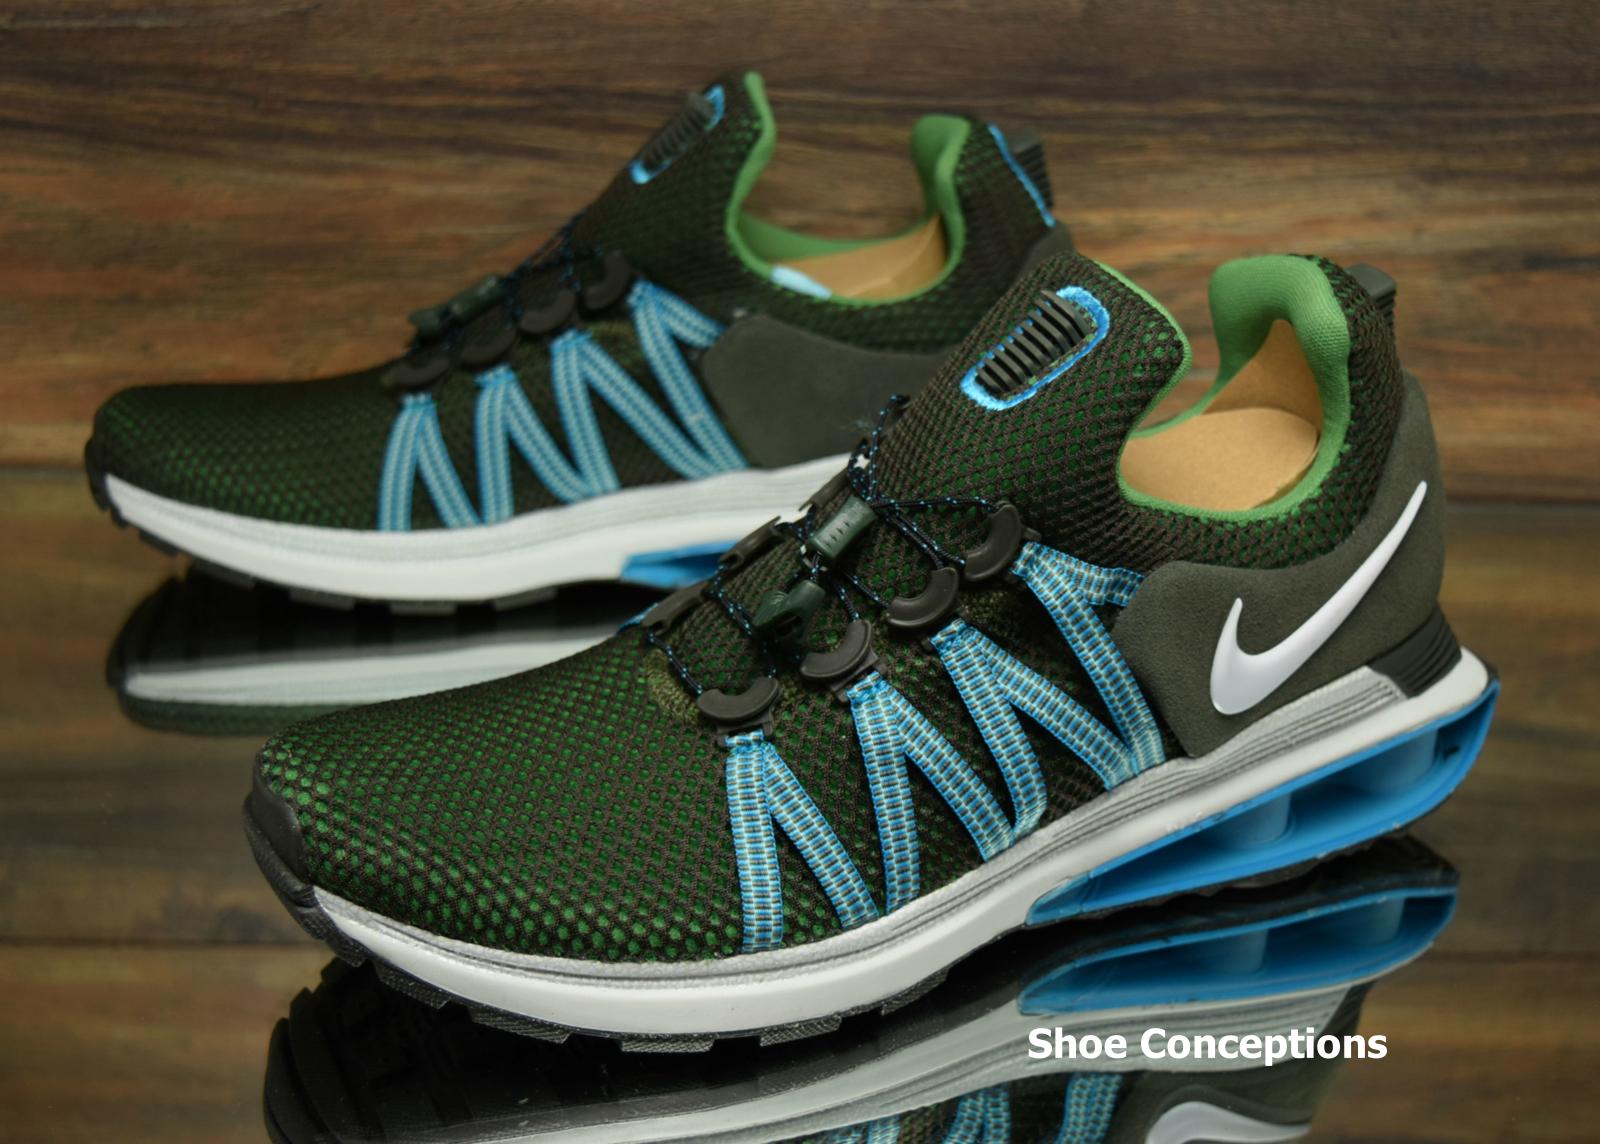 Nike Shox Gravity Sequoia Green AR1999-300 Running Running Running shoes Men's - Multi Size 5bfe53